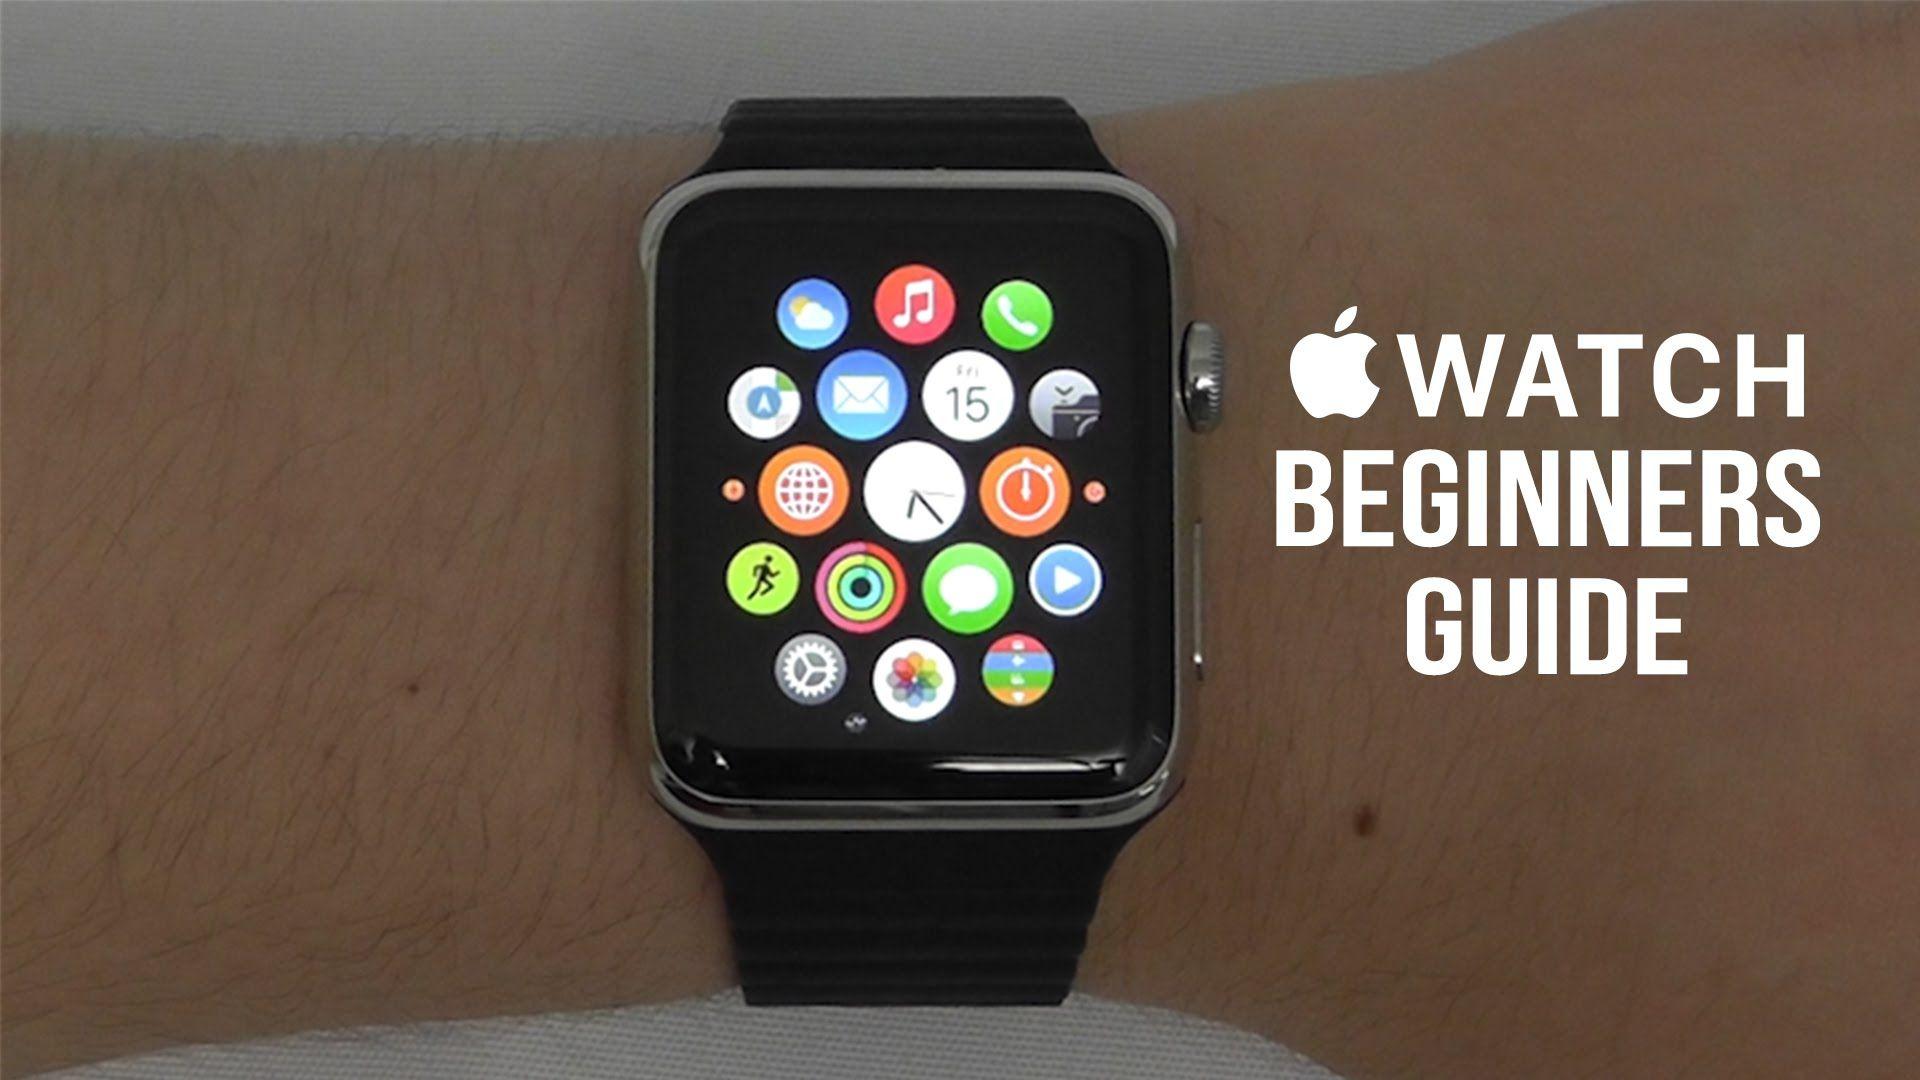 50+ Apple Watch Tips and Tricks + Hidden Features